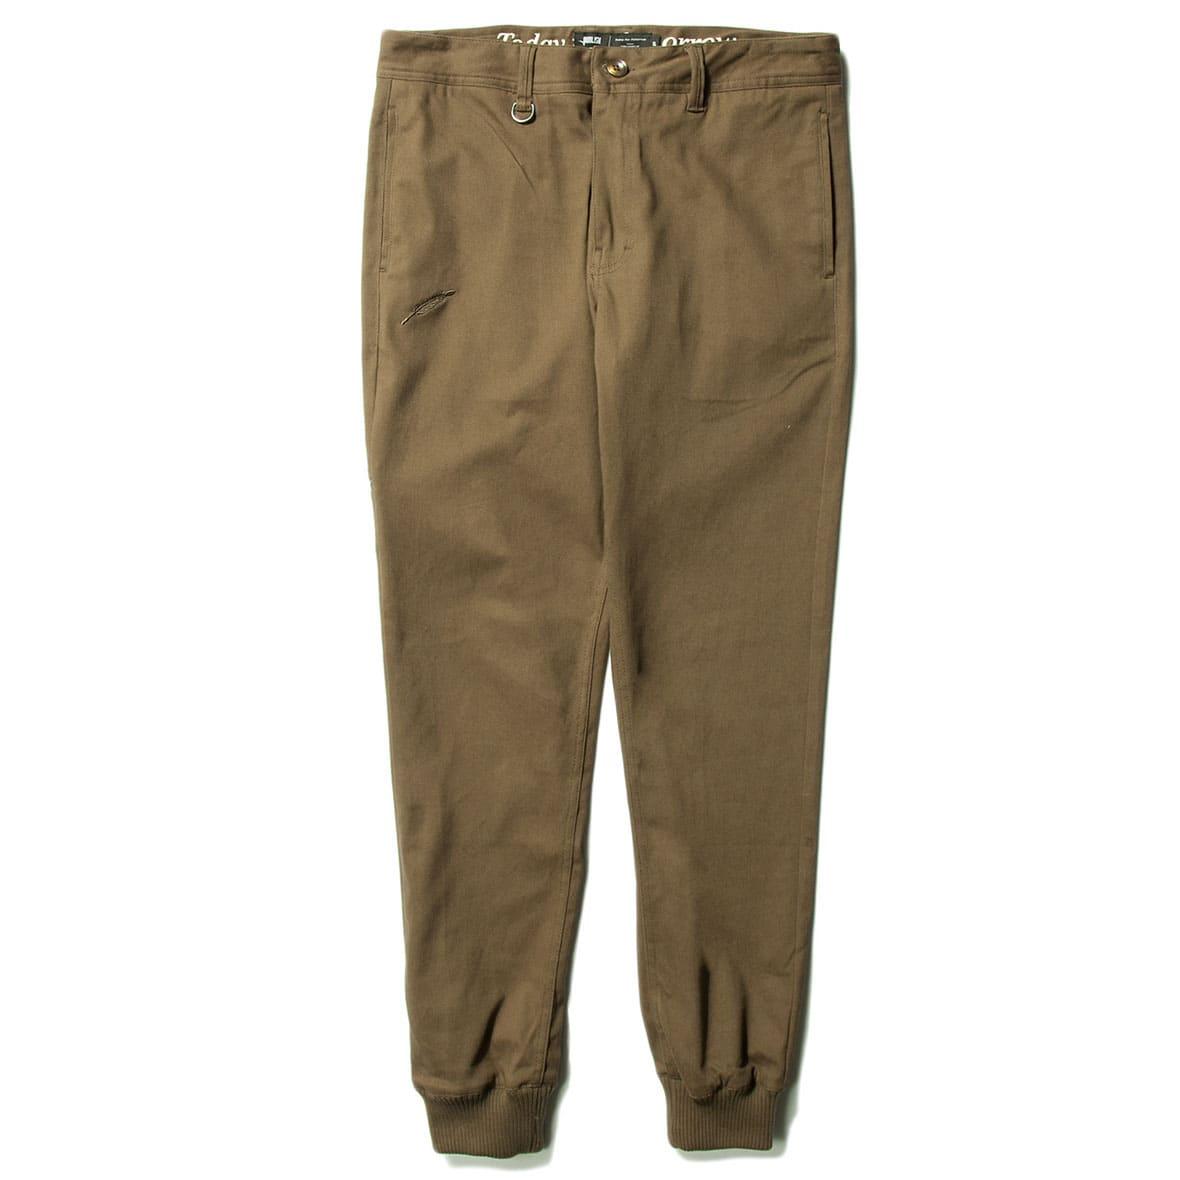 posh jogging pants